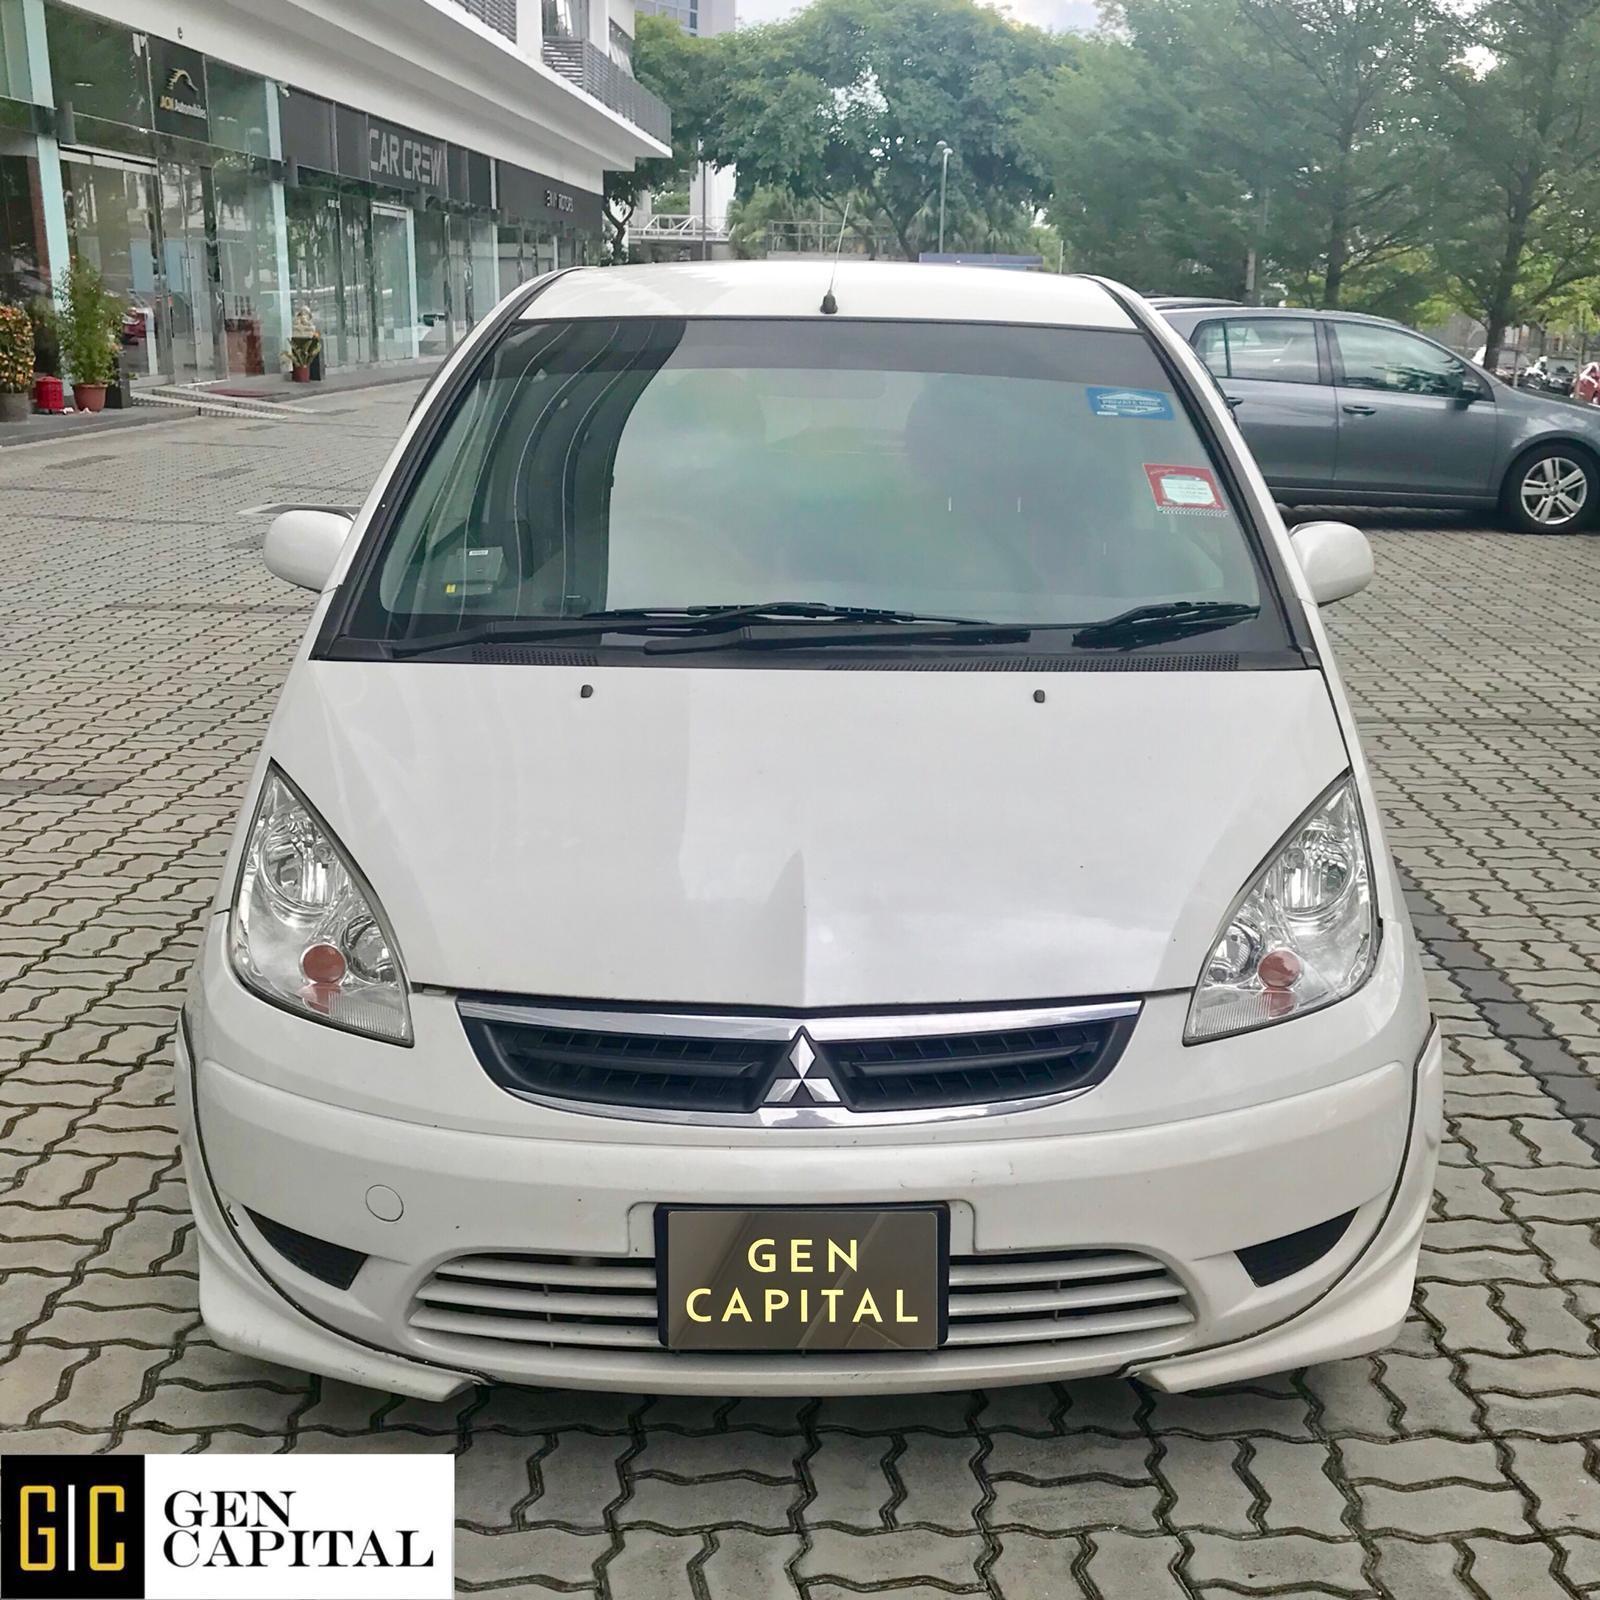 Mitsubishi Coltplus 1.5A Grab Gojek Ryde Tada & Non PHV Car Rental in Singapore!